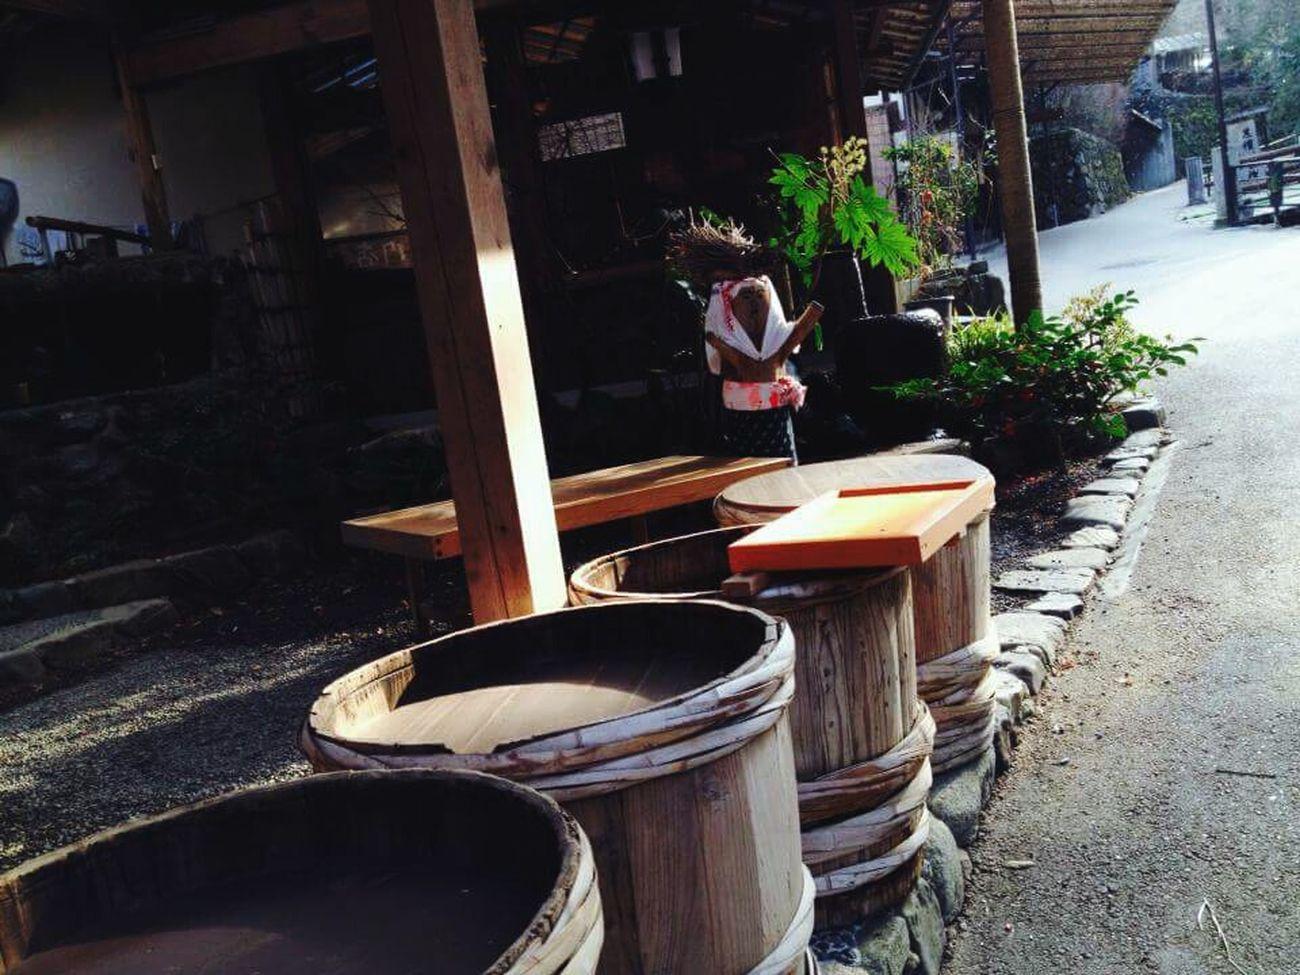 Taking Photos Trip Photo Japan Photography Tokyo,Japan Ancient City Japan 大原